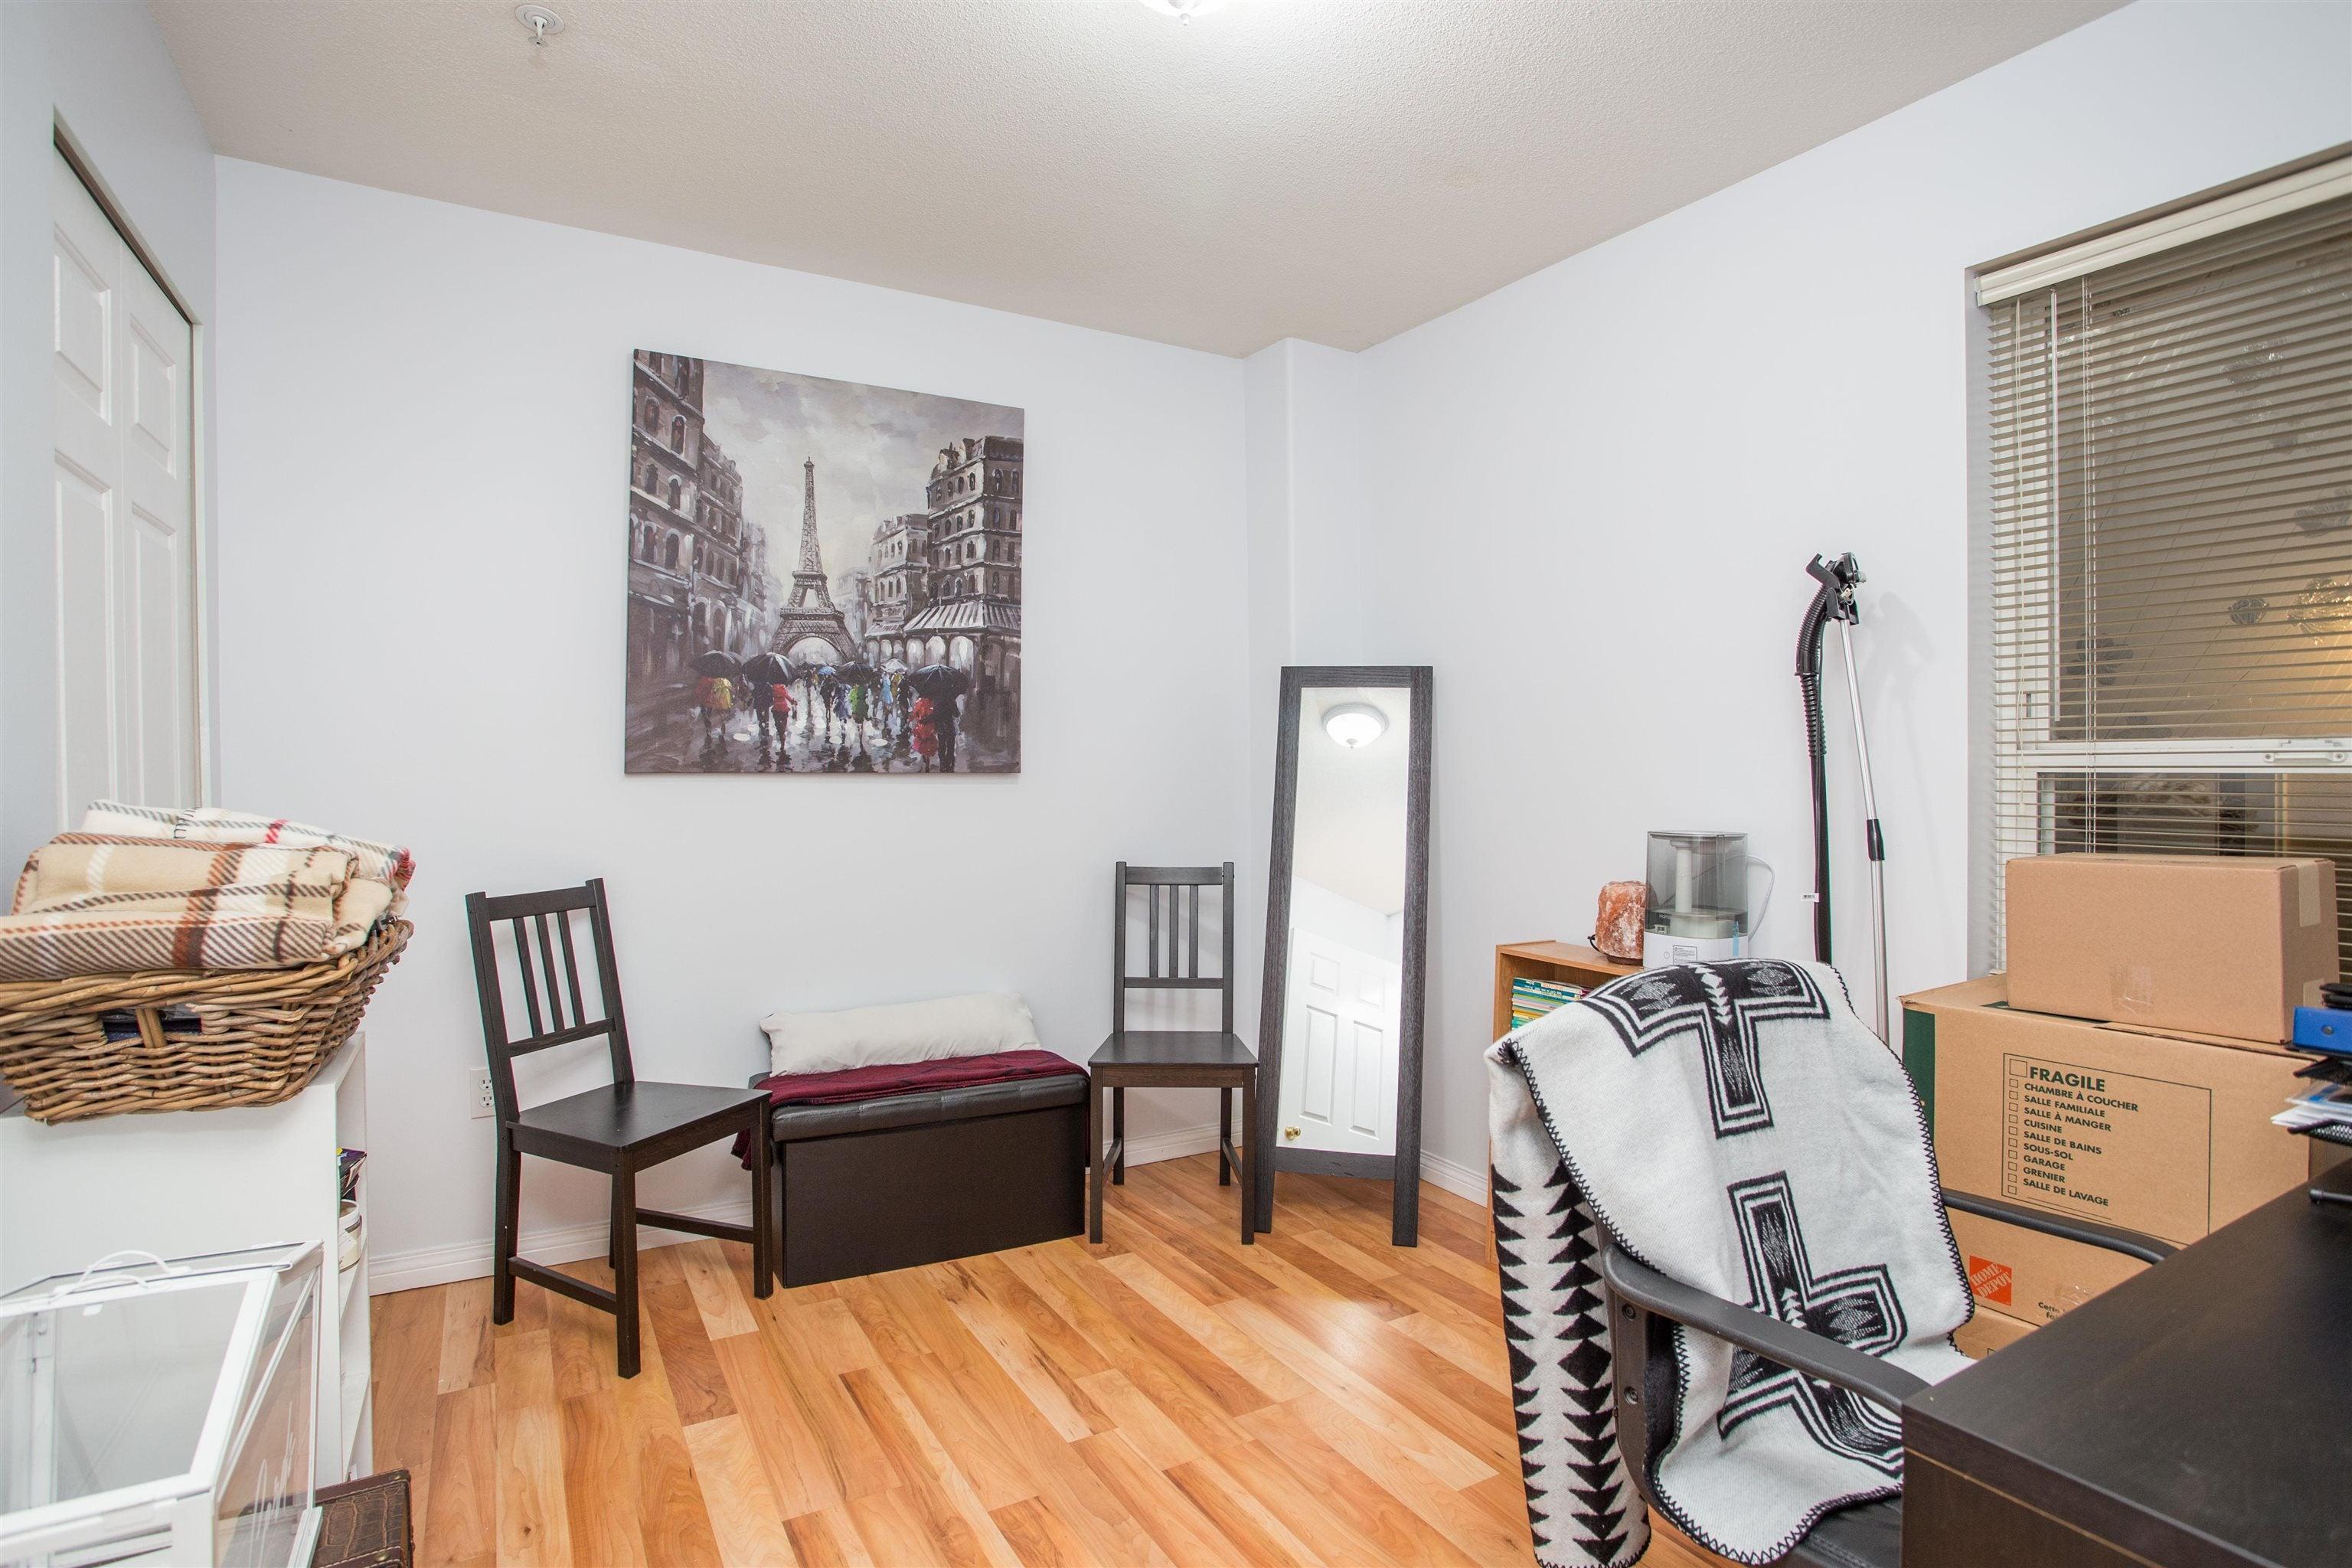 7 205 LEBLEU STREET - Maillardville Apartment/Condo for sale, 3 Bedrooms (R2625671) - #21